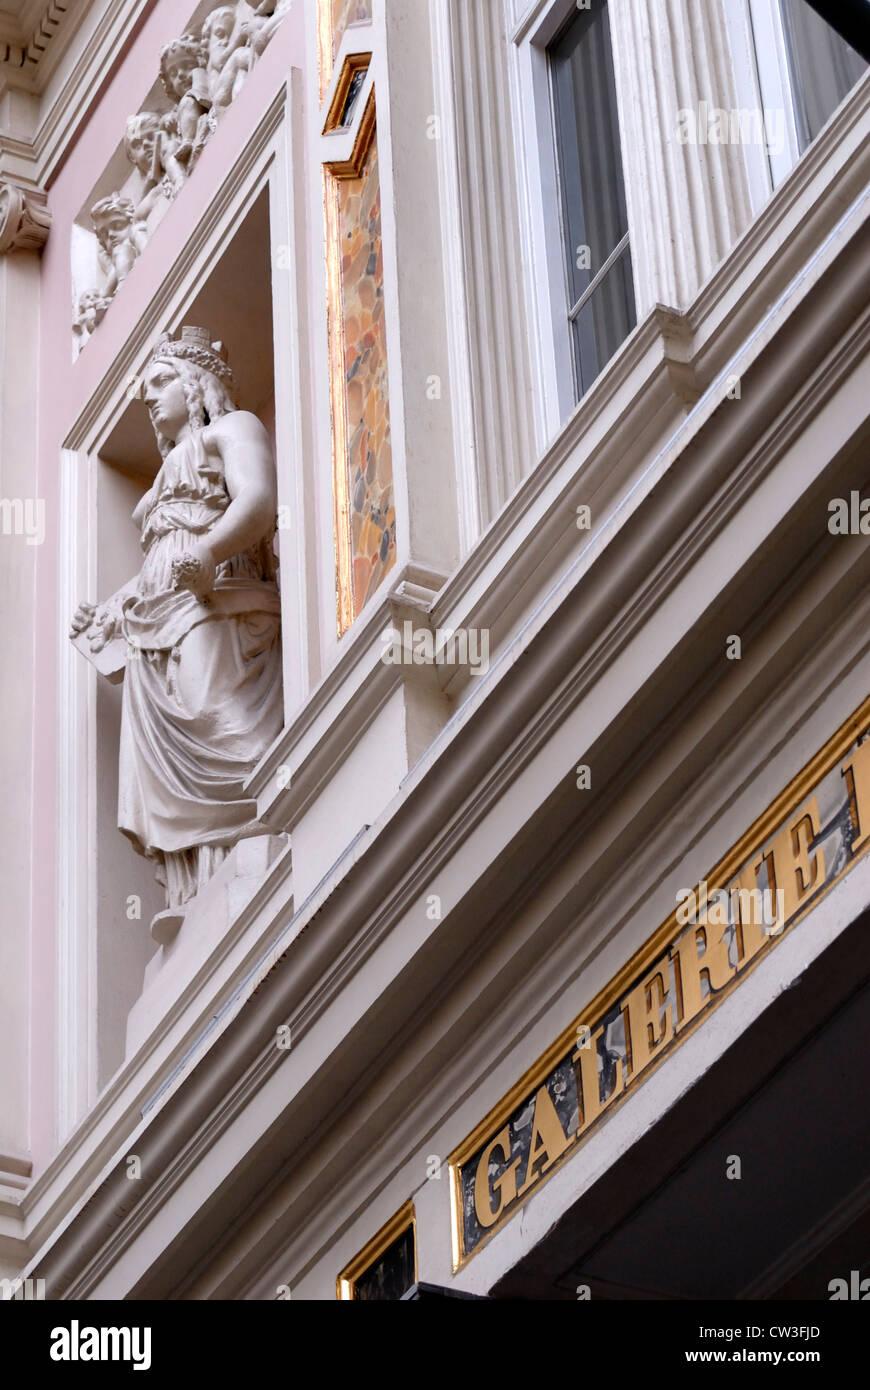 Brussels, Belgium. Galeries St Hubert - detail - Stock Image